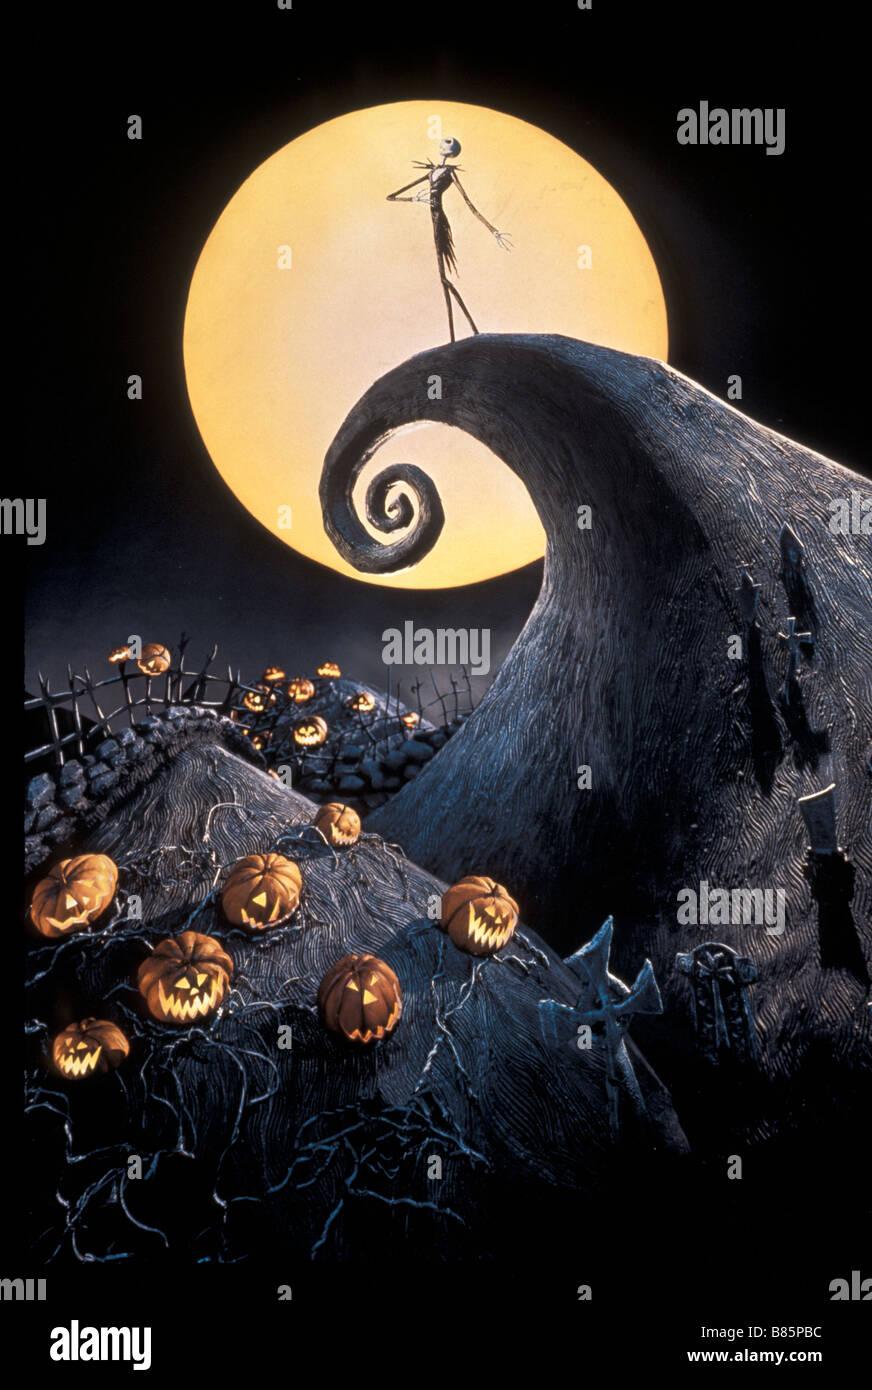 Nightmare Before Christmas Pumpkin Stock Photos & Nightmare Before ...